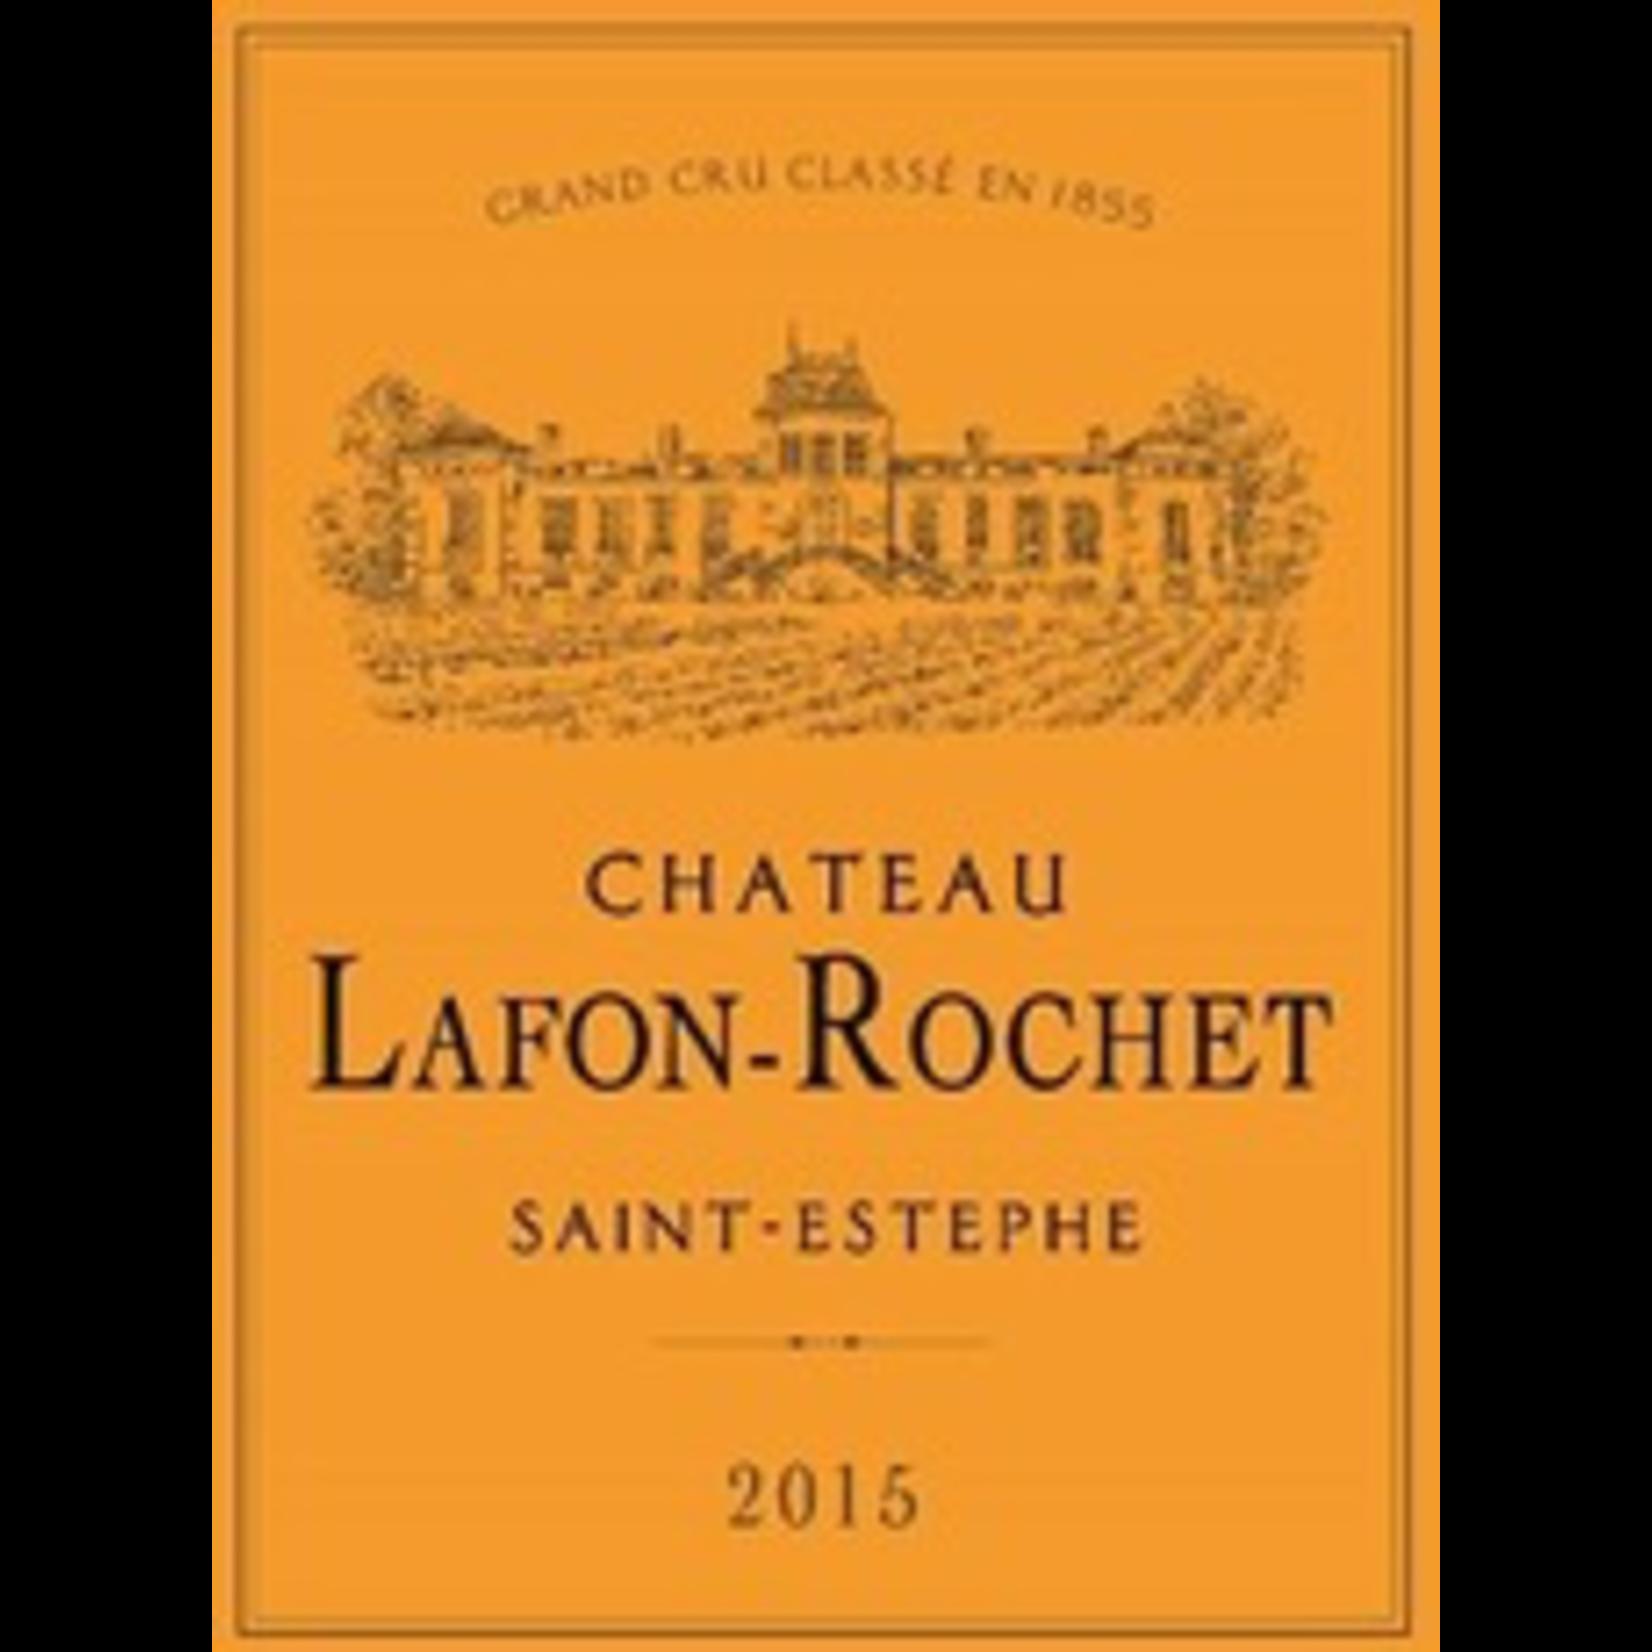 Chateau Lafon Rochet 2015